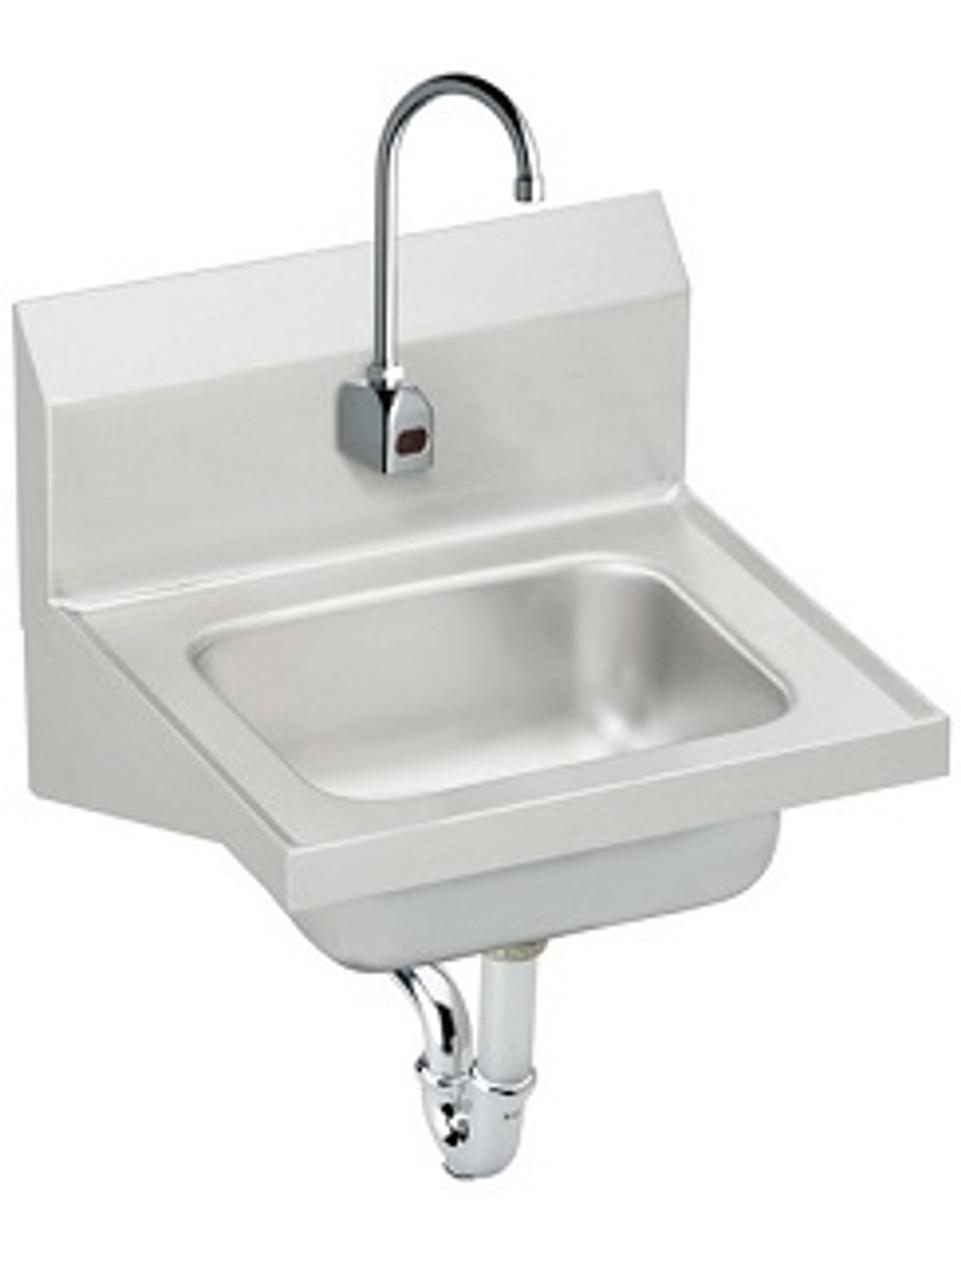 https www prodrinkingfountains com elkay chs1716sactmc hand wash up commercial sink